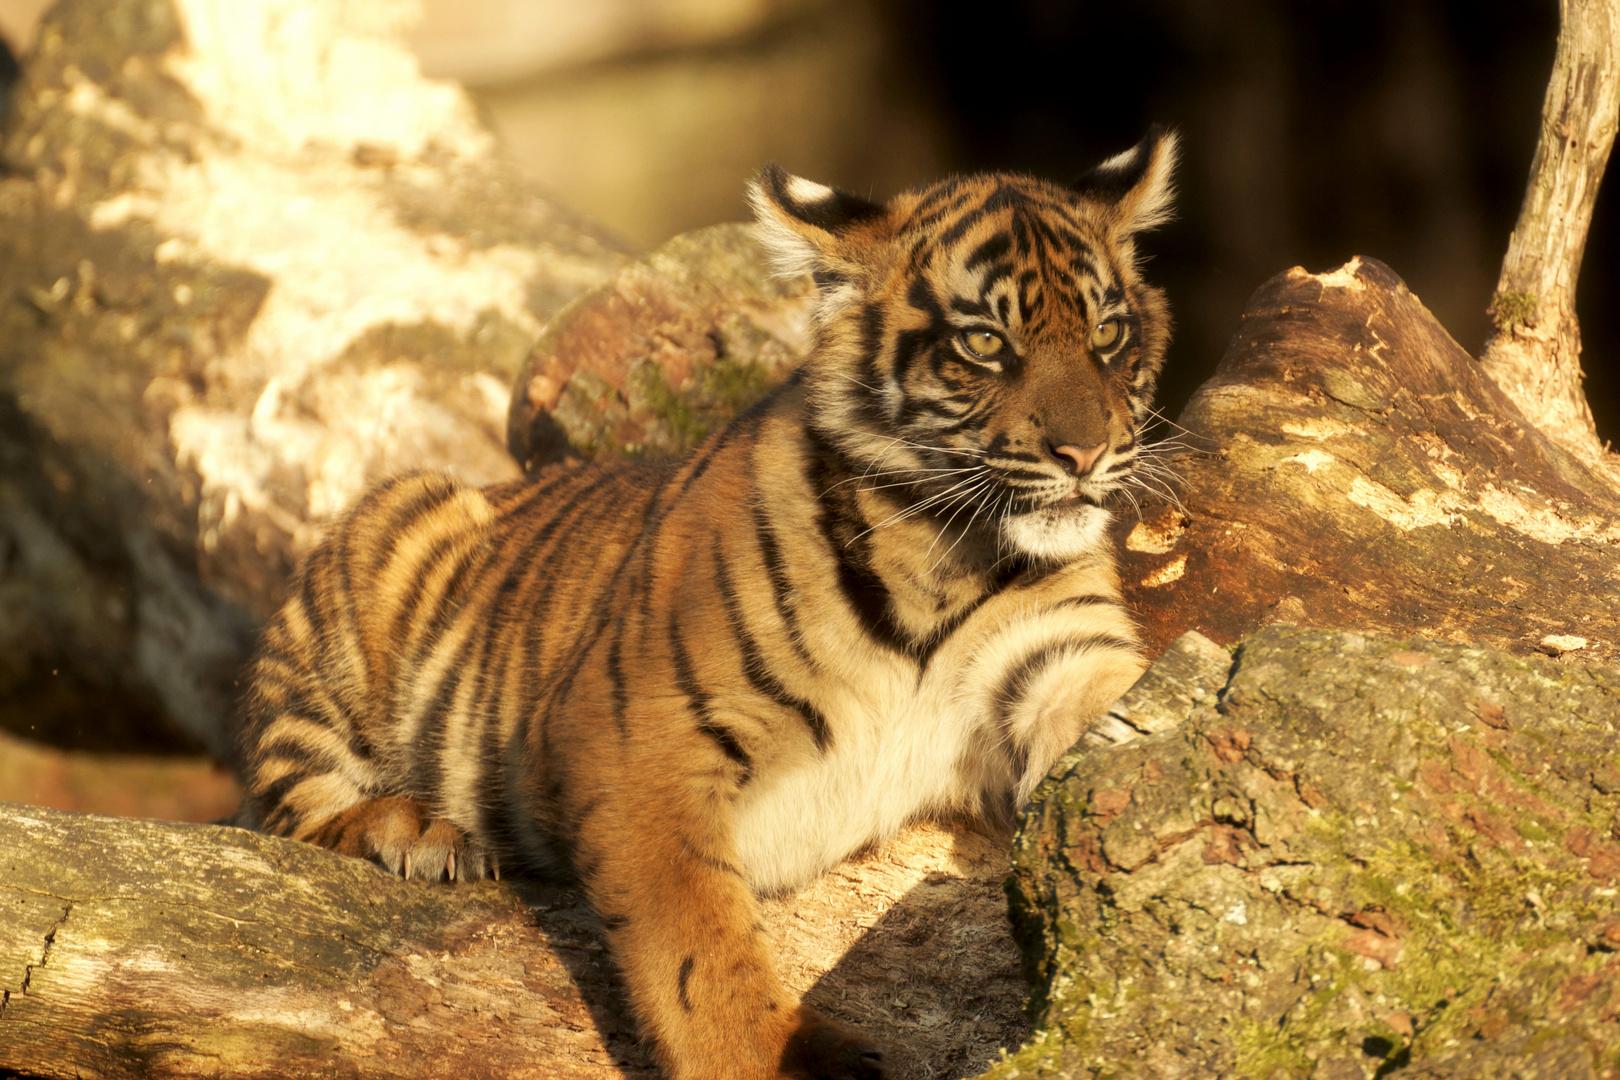 Tiger Nachwuchs